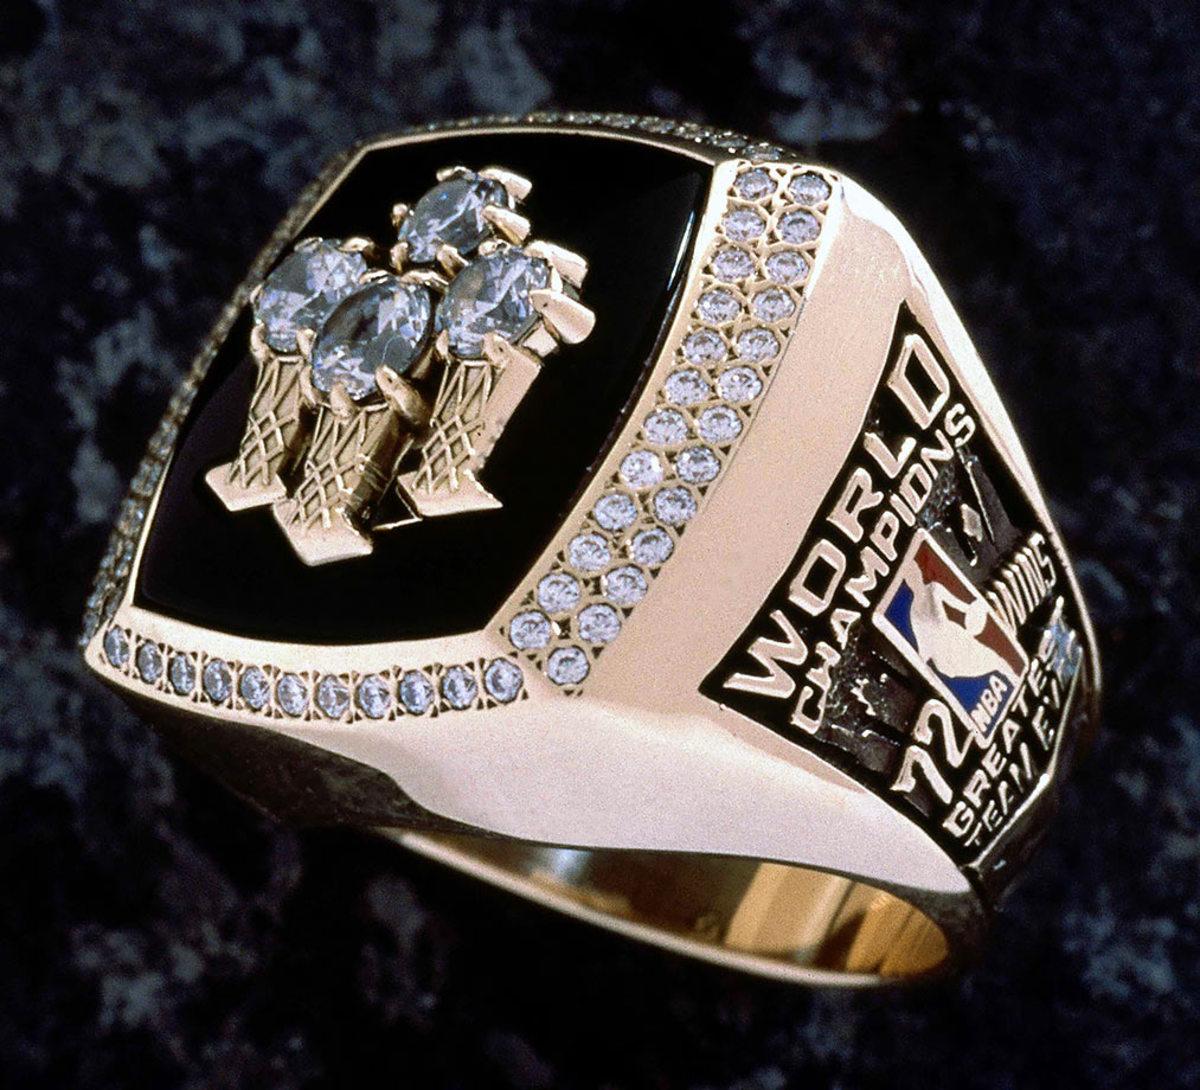 1996-Chicago-Bulls-NBA-Championship-ring.jpg